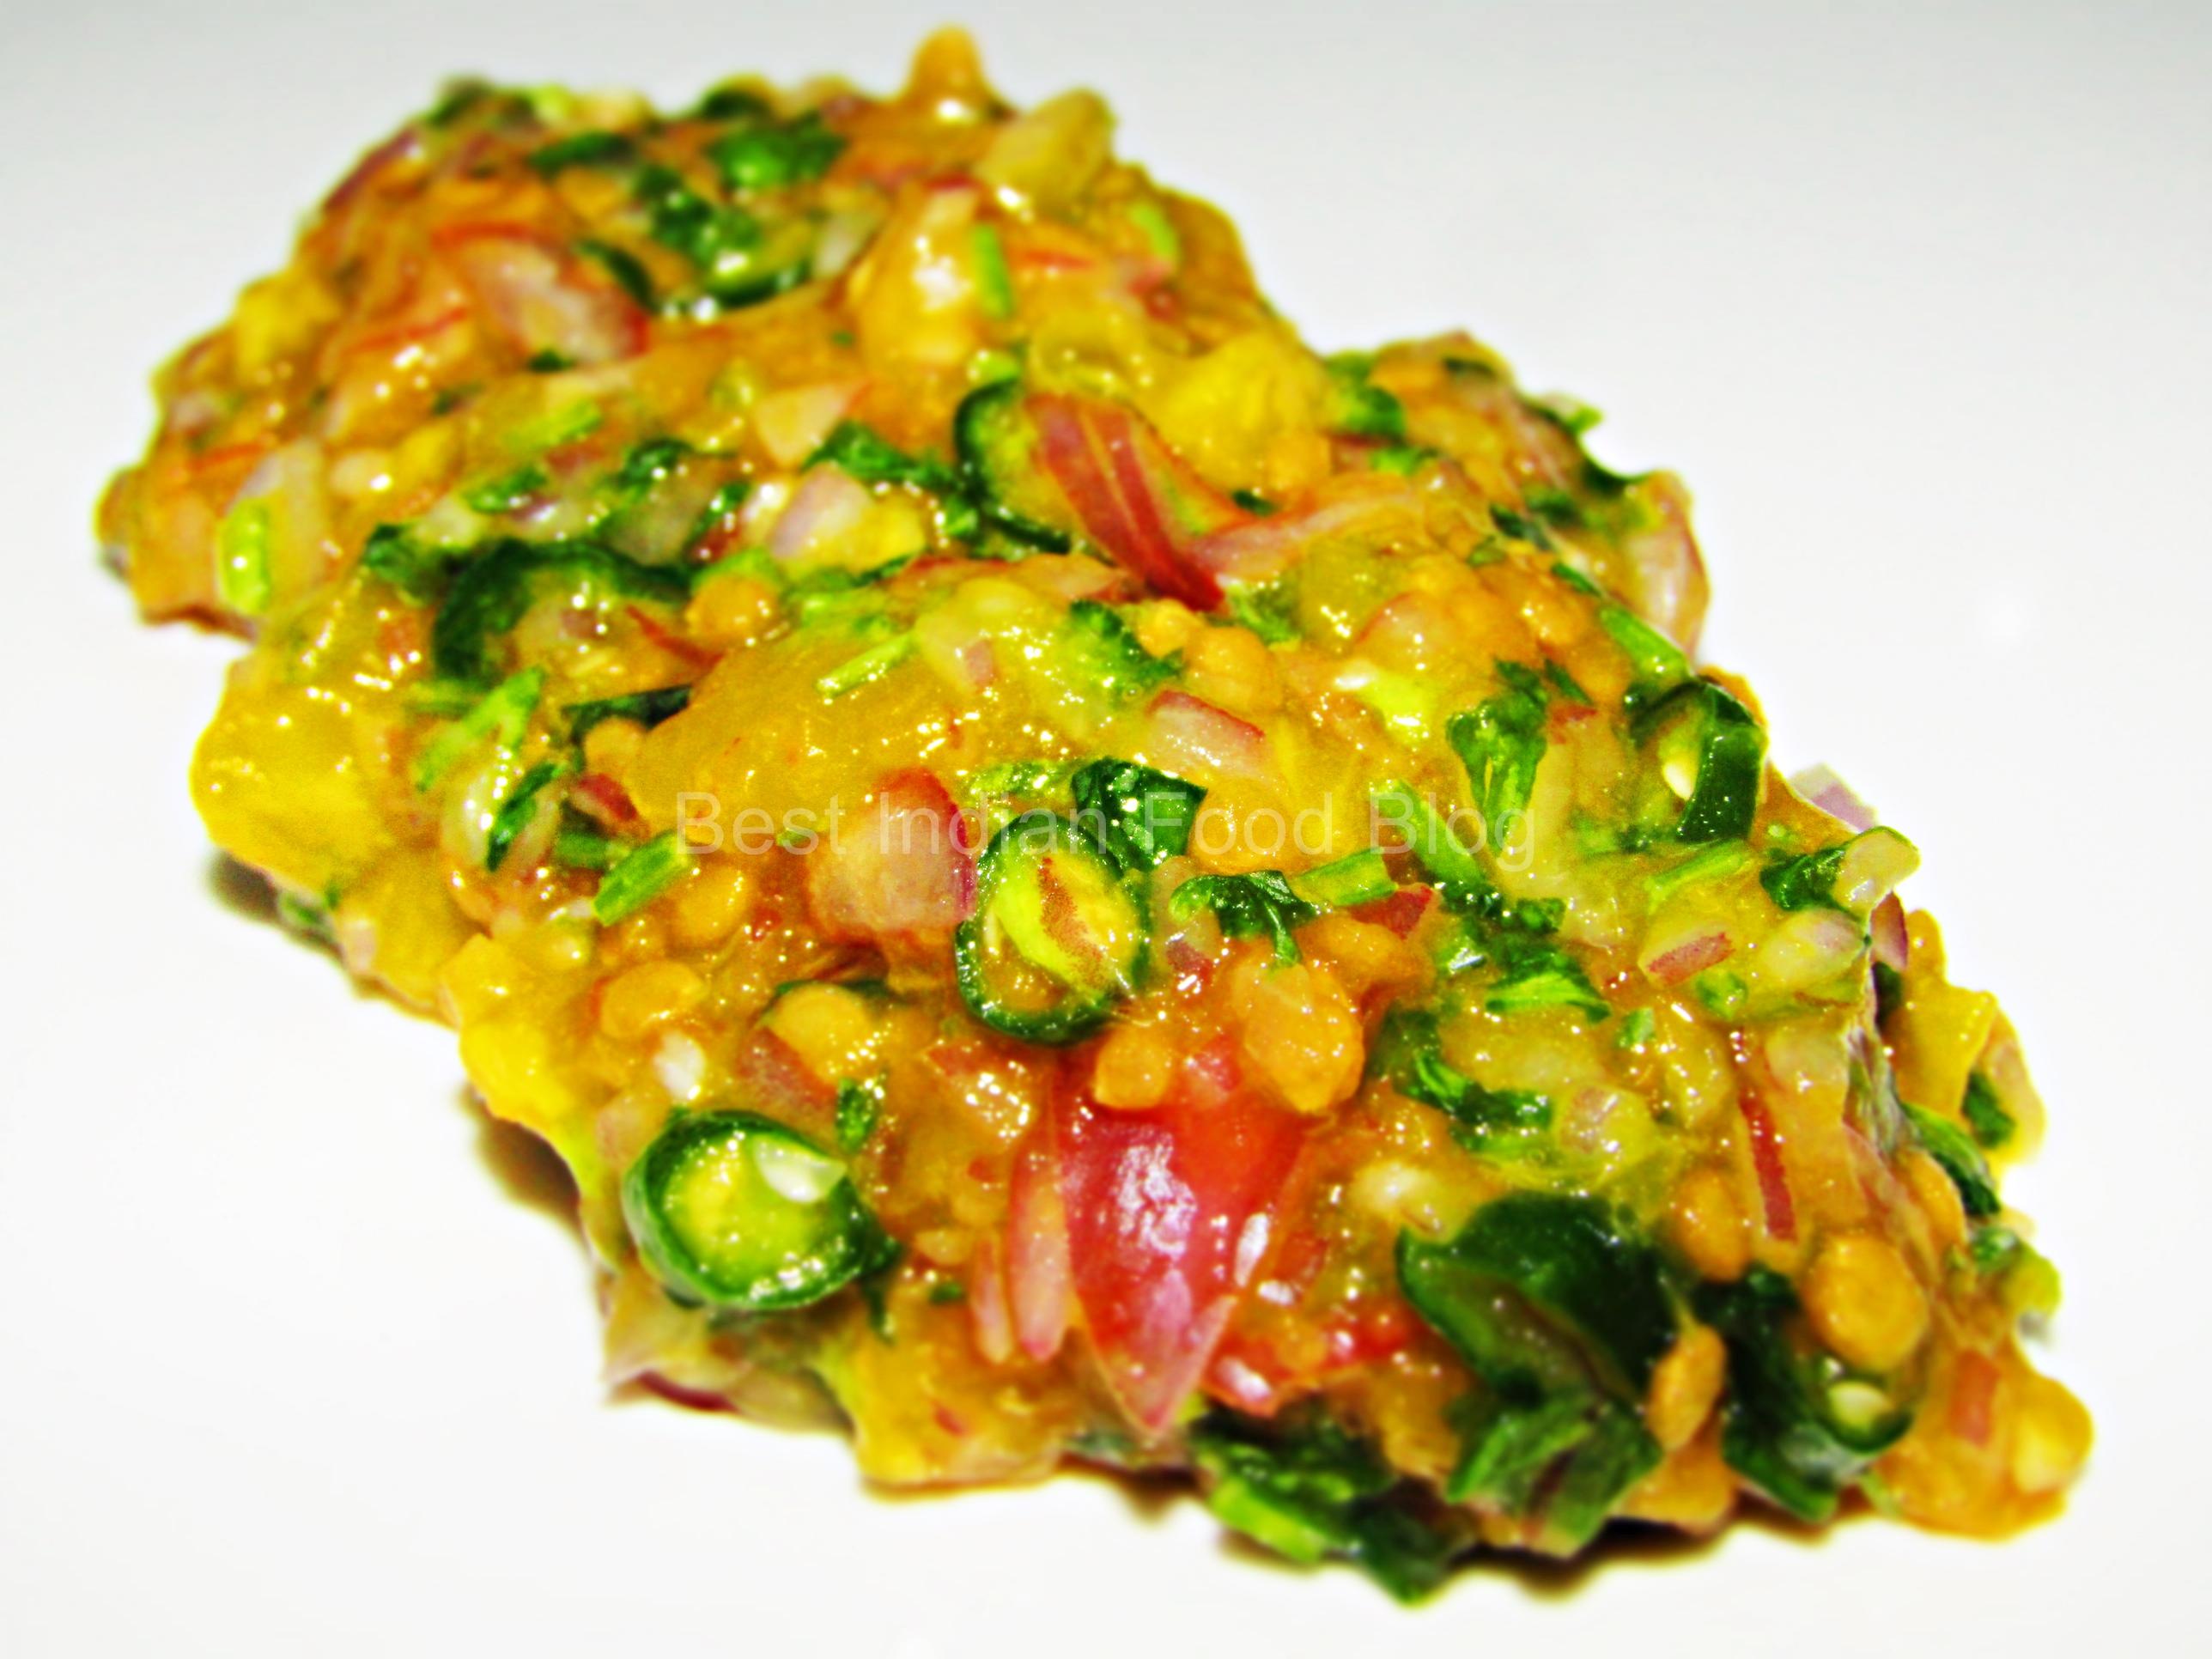 Rukh Tamatar ko Achar from Sikkim, India | Best Indian Food Blog | Tamarillo recipe